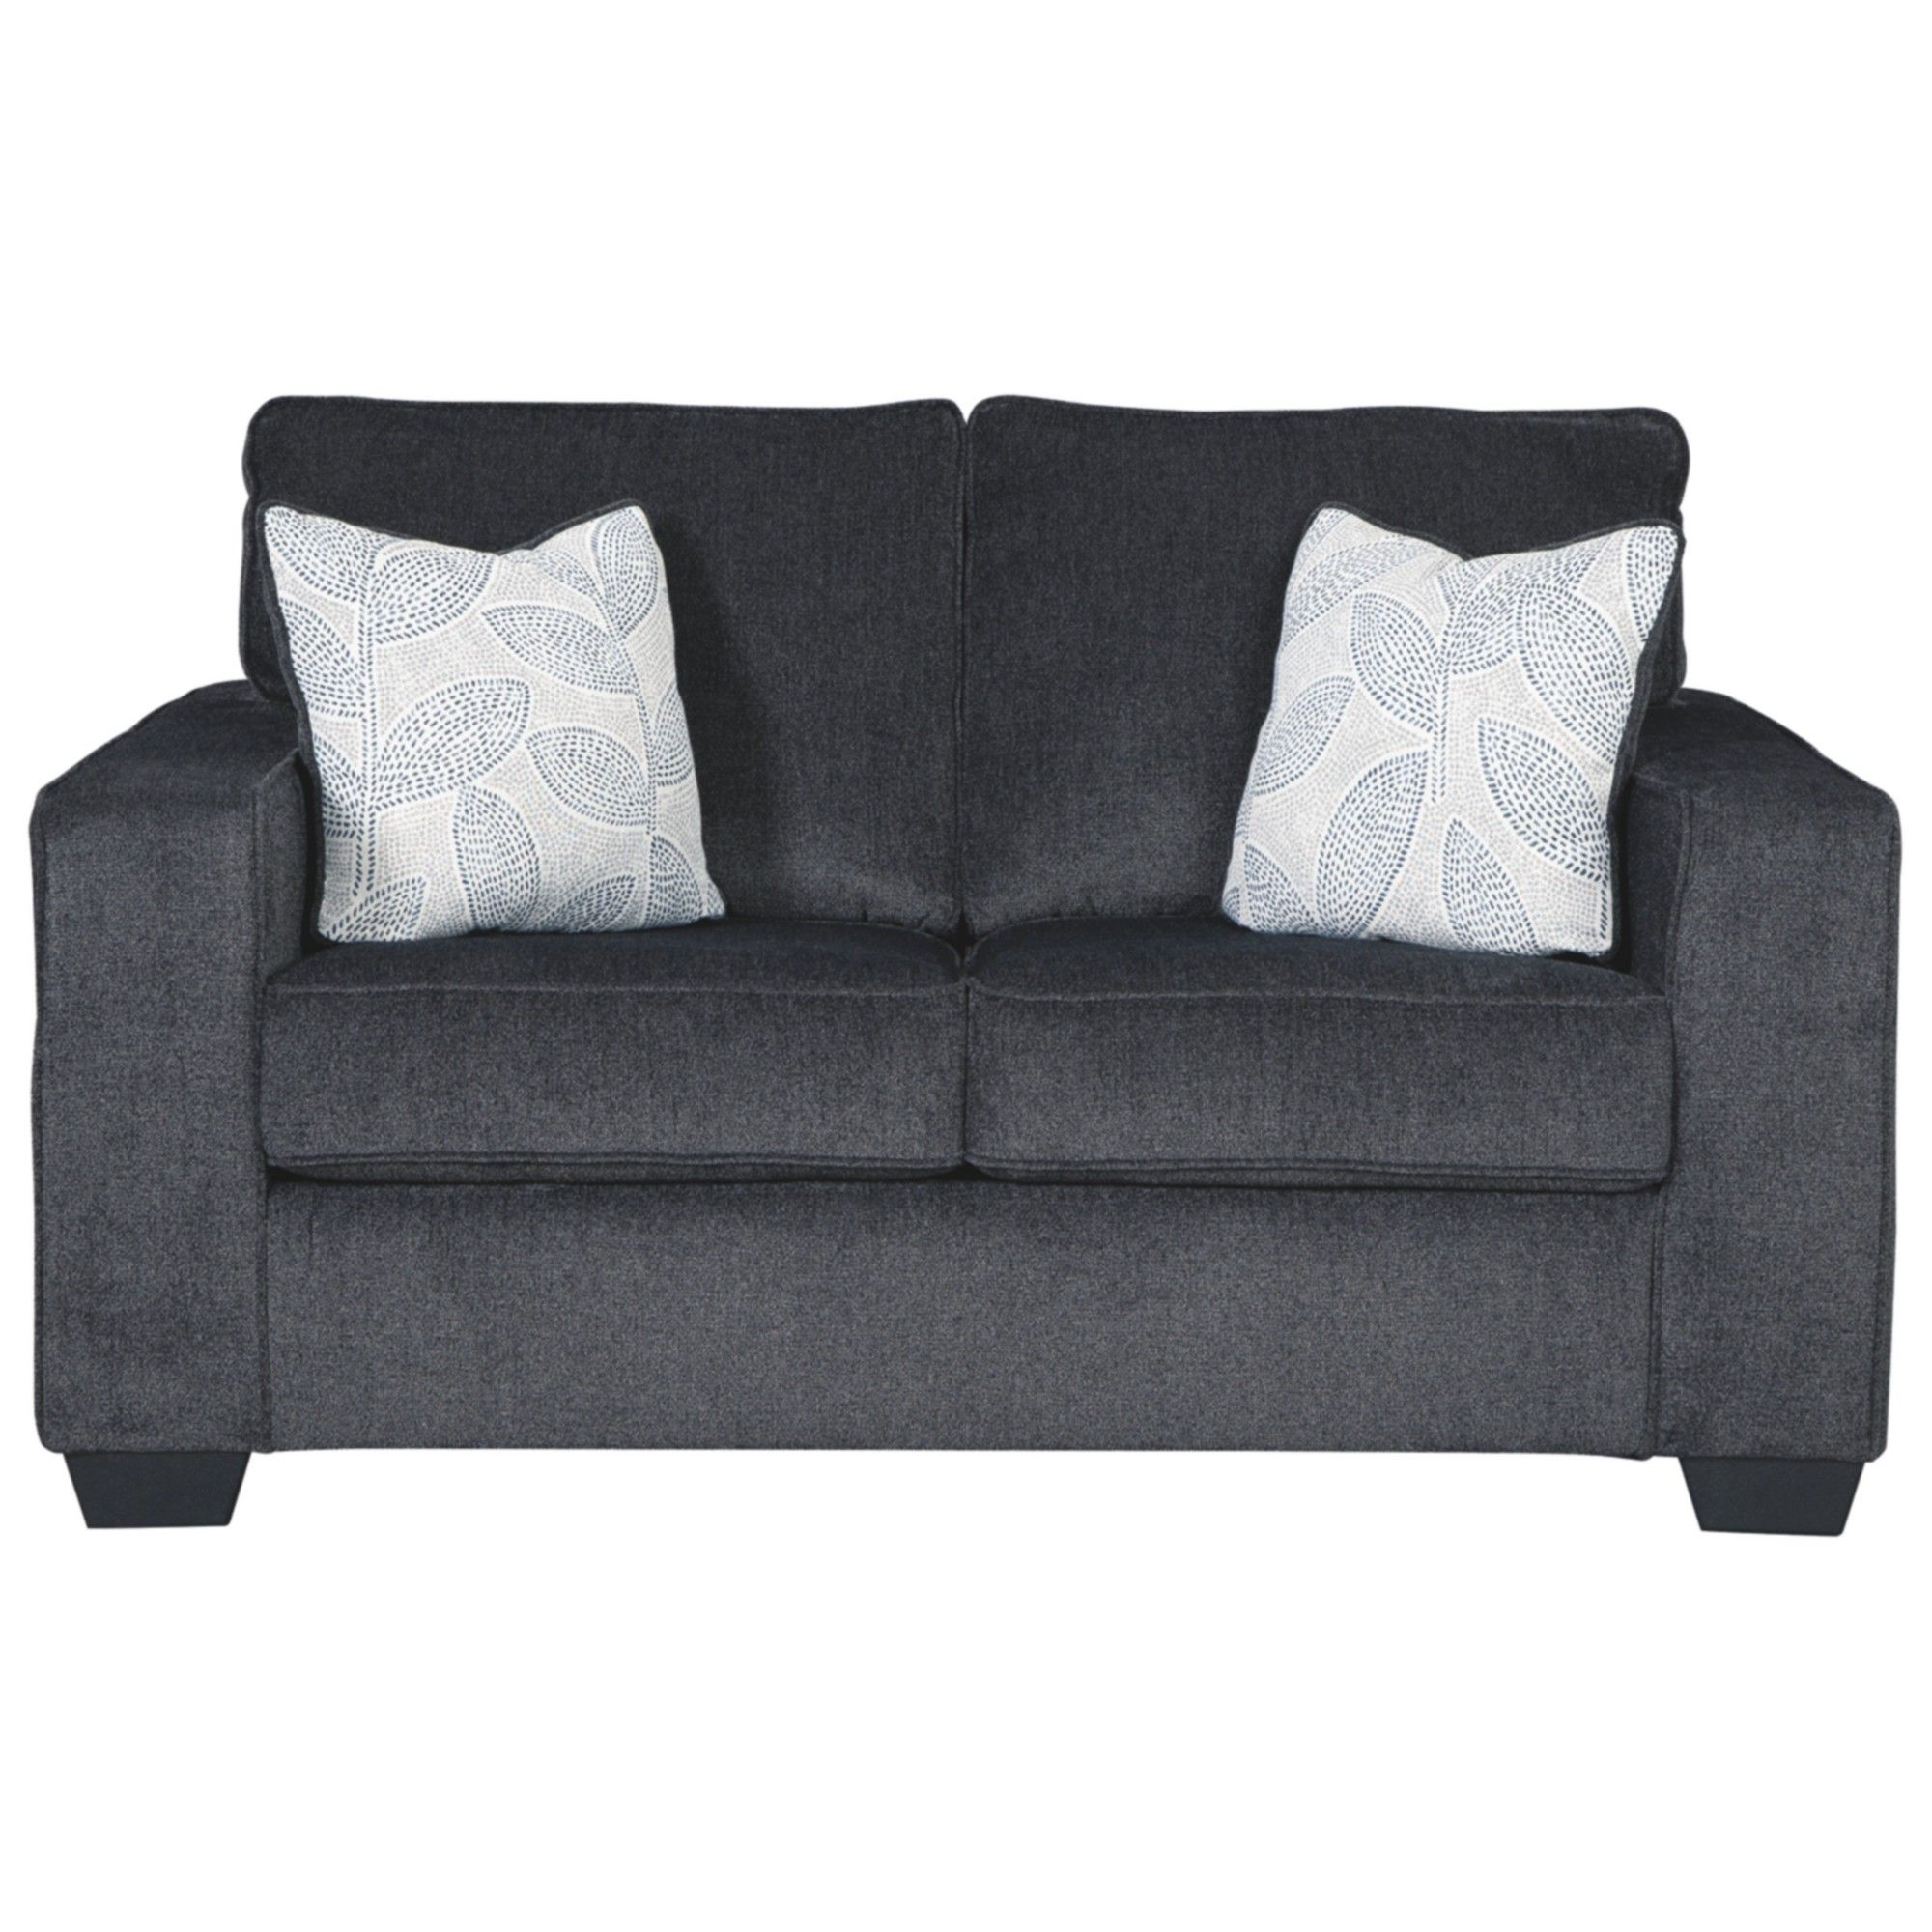 Wondrous Signature Design By Ashley Altari Loveseat Slate Gray Machost Co Dining Chair Design Ideas Machostcouk